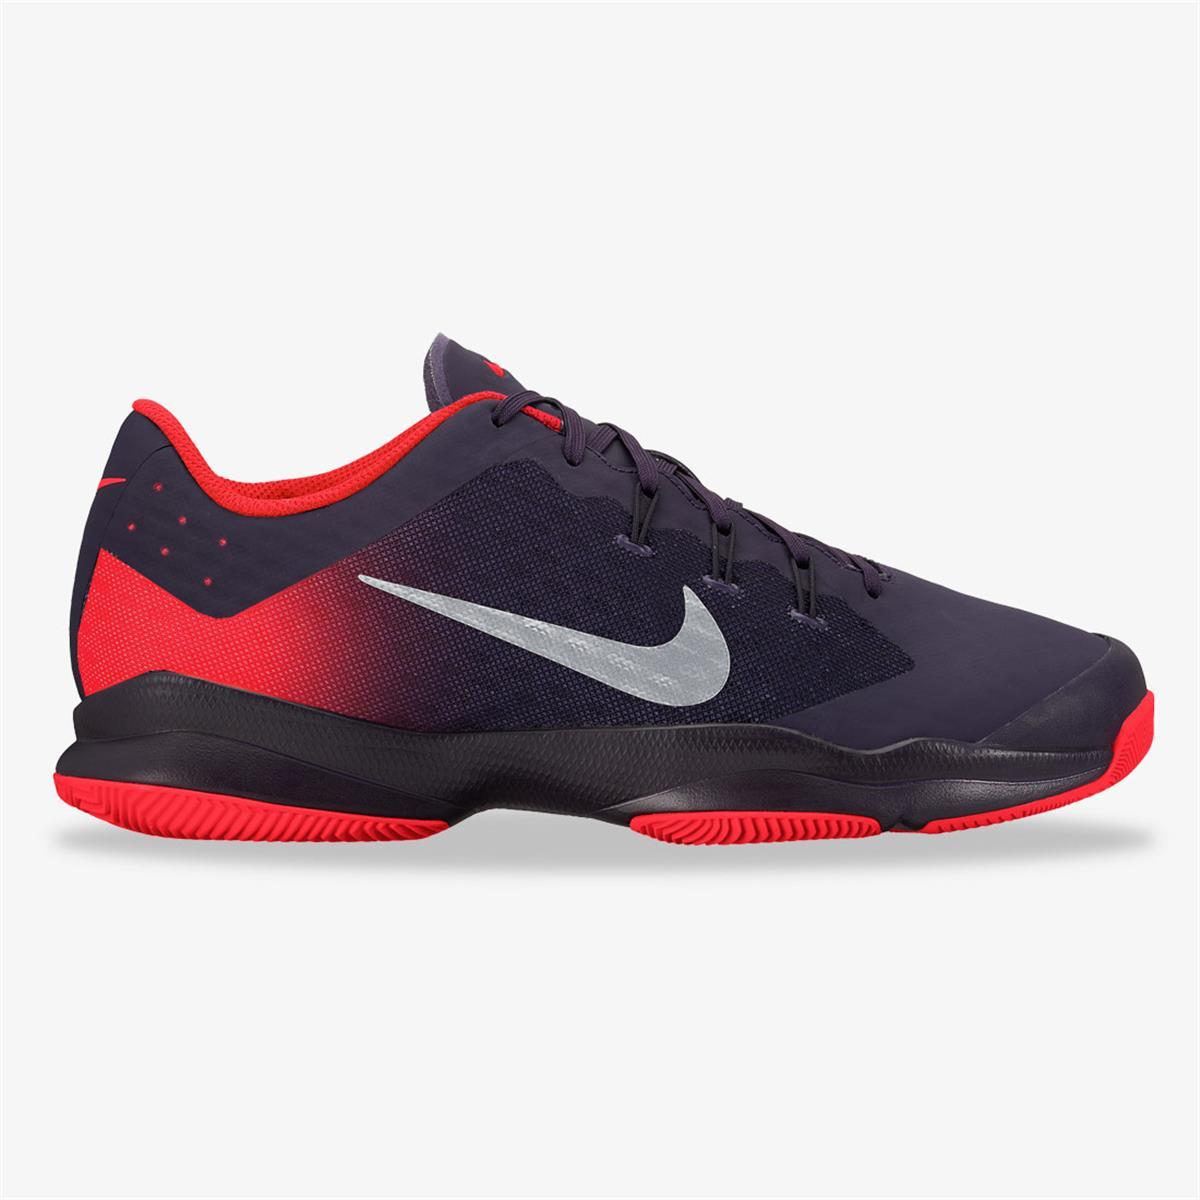 sports direct mens tennis shoes 28 images slazenger